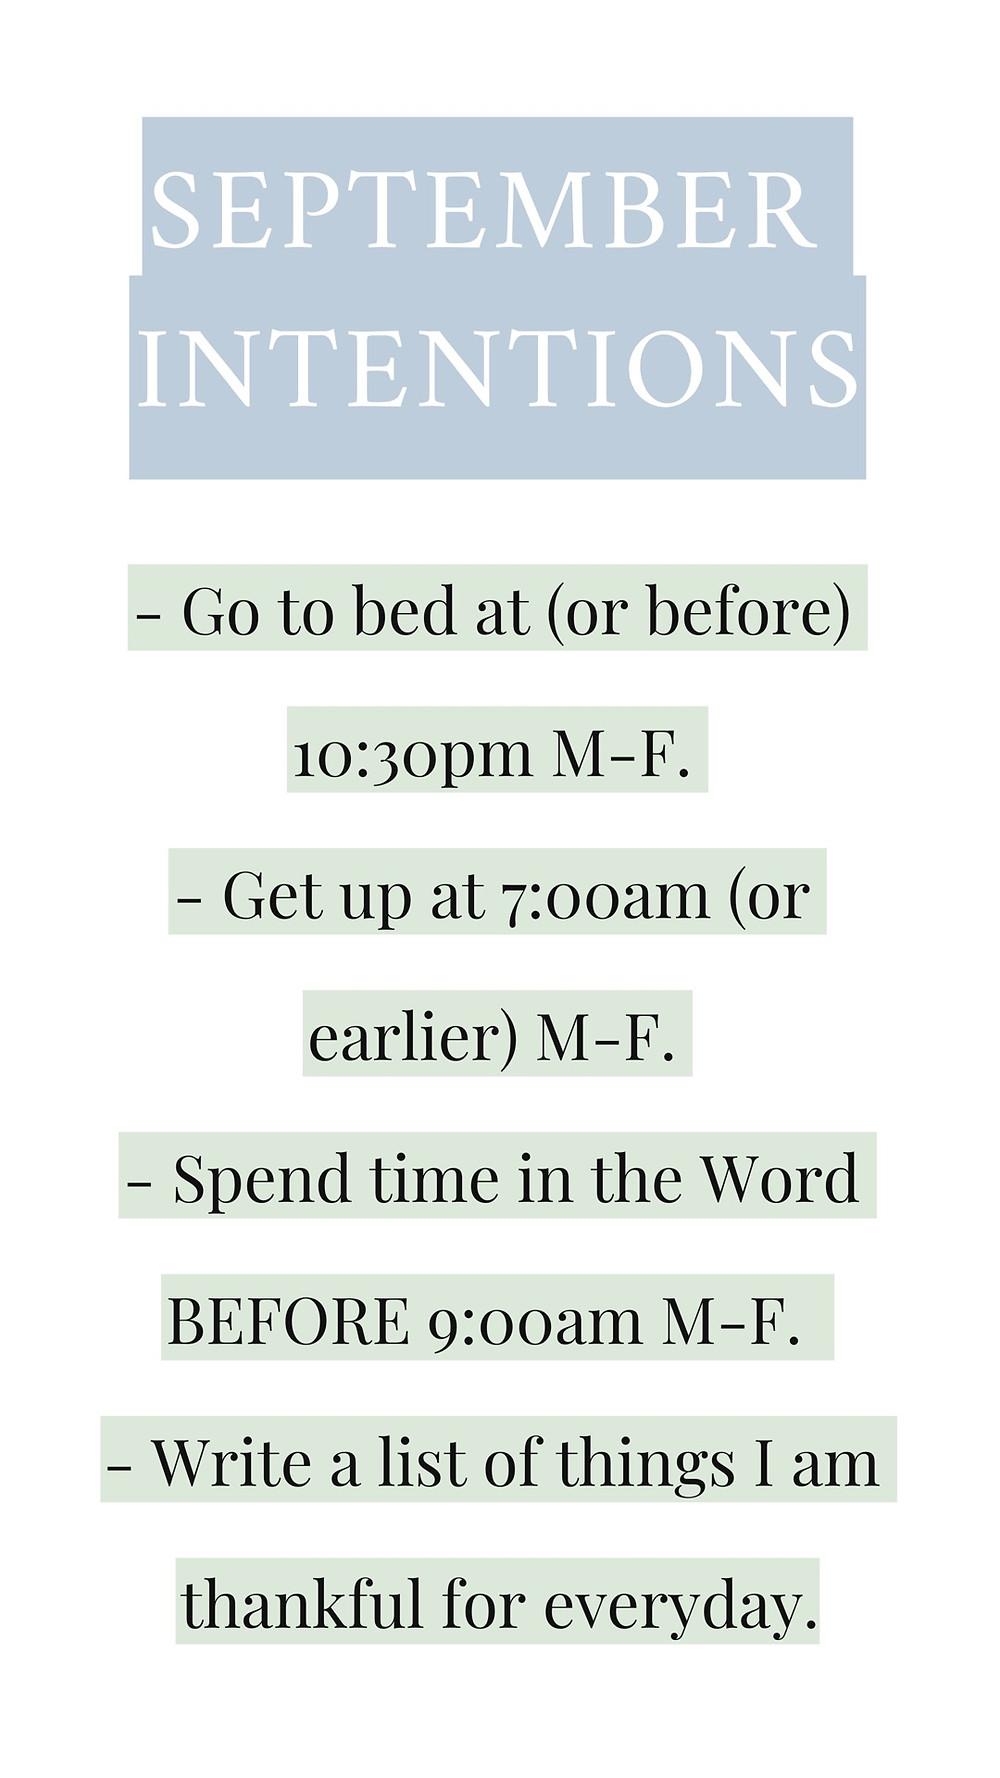 September Intentions